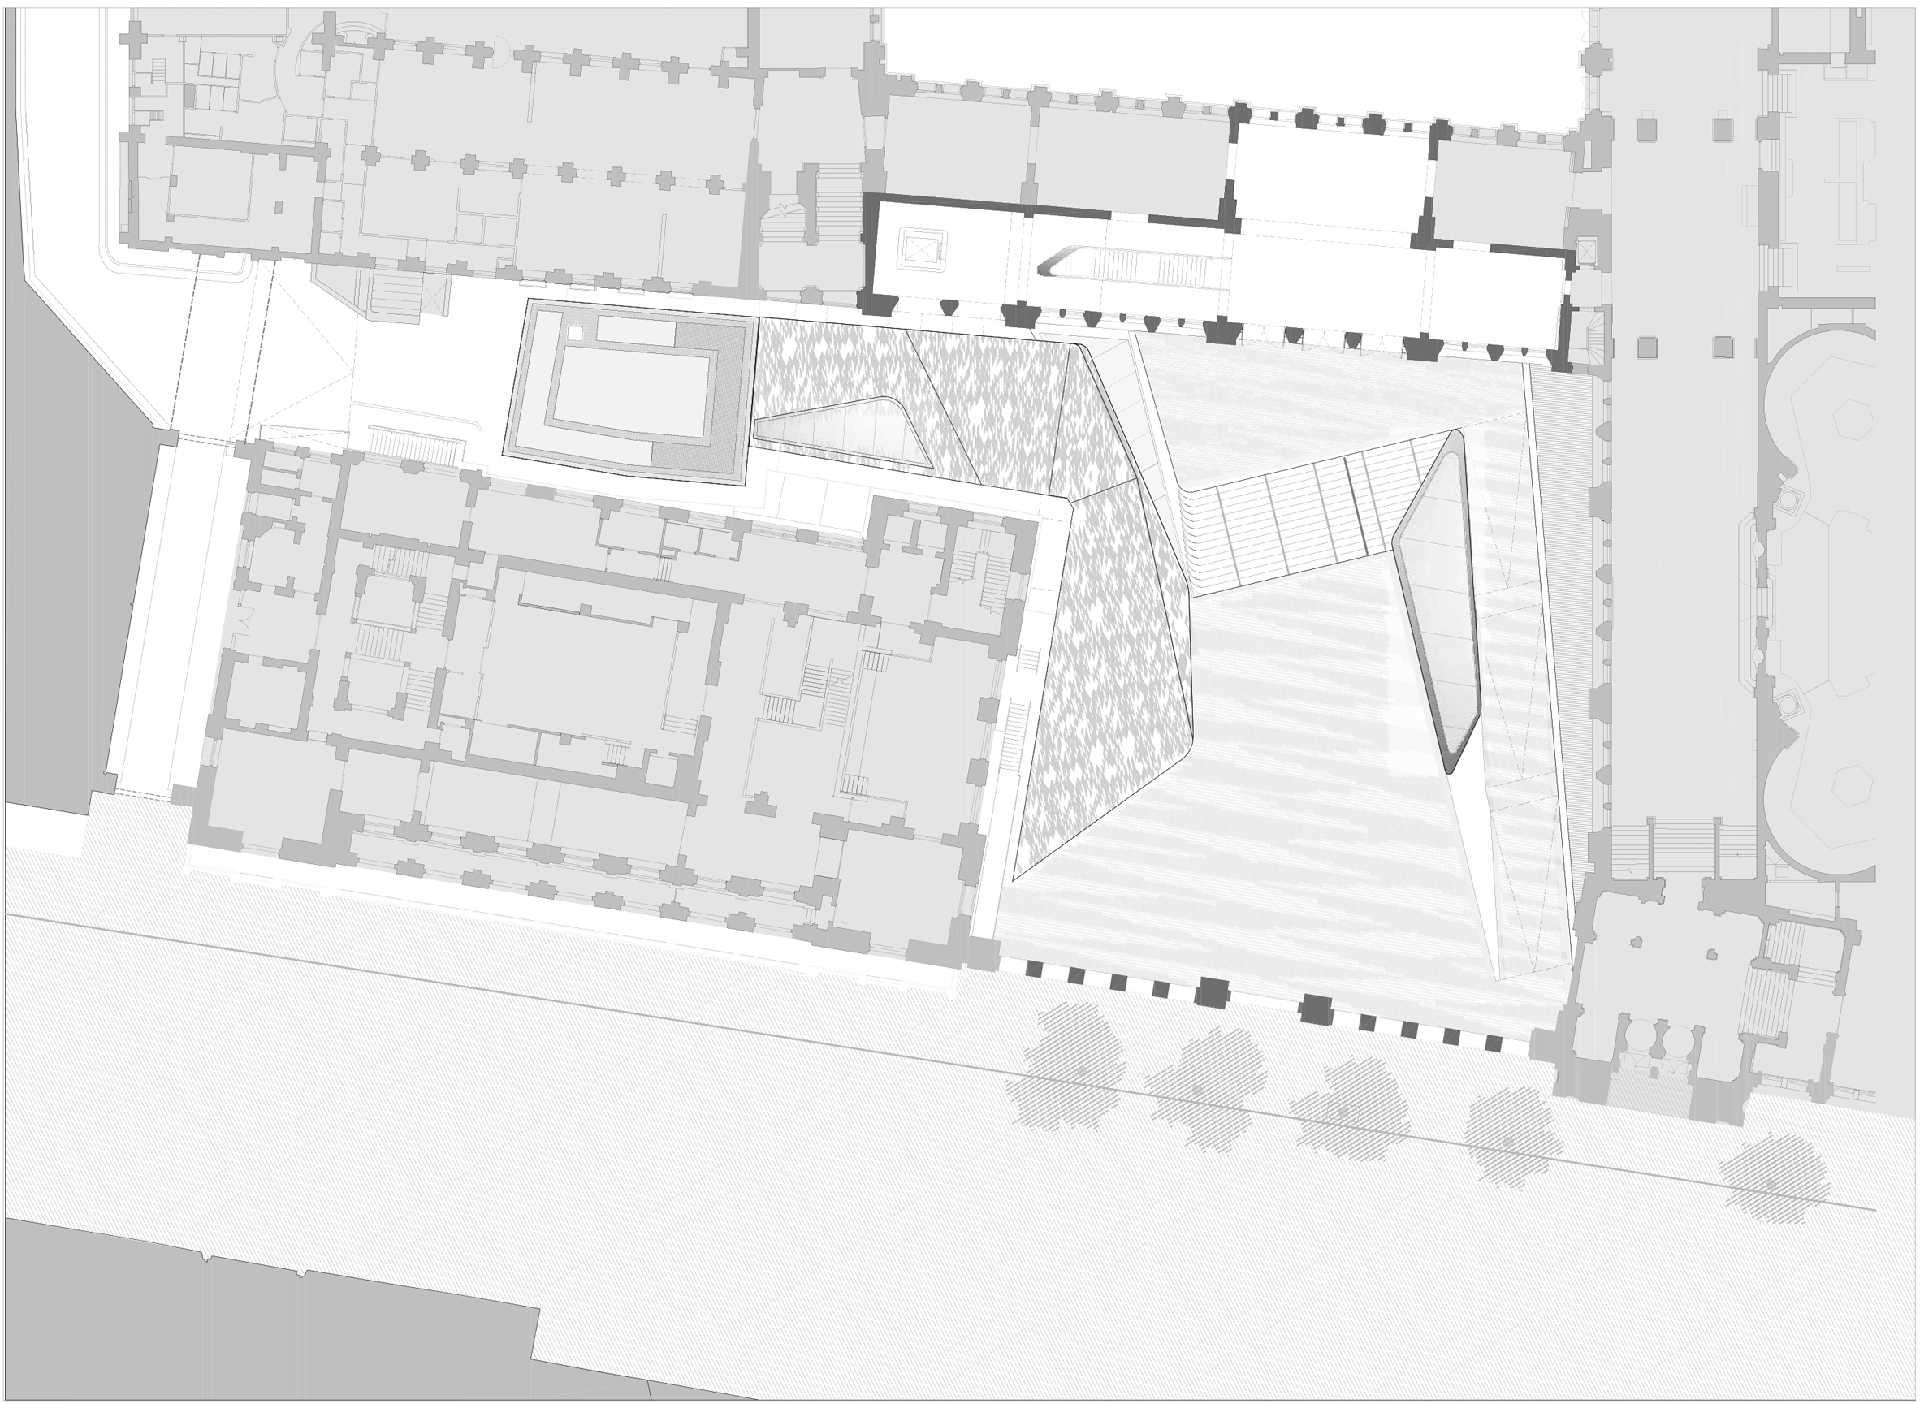 Victoria and Albert Museum  - 50 05 39